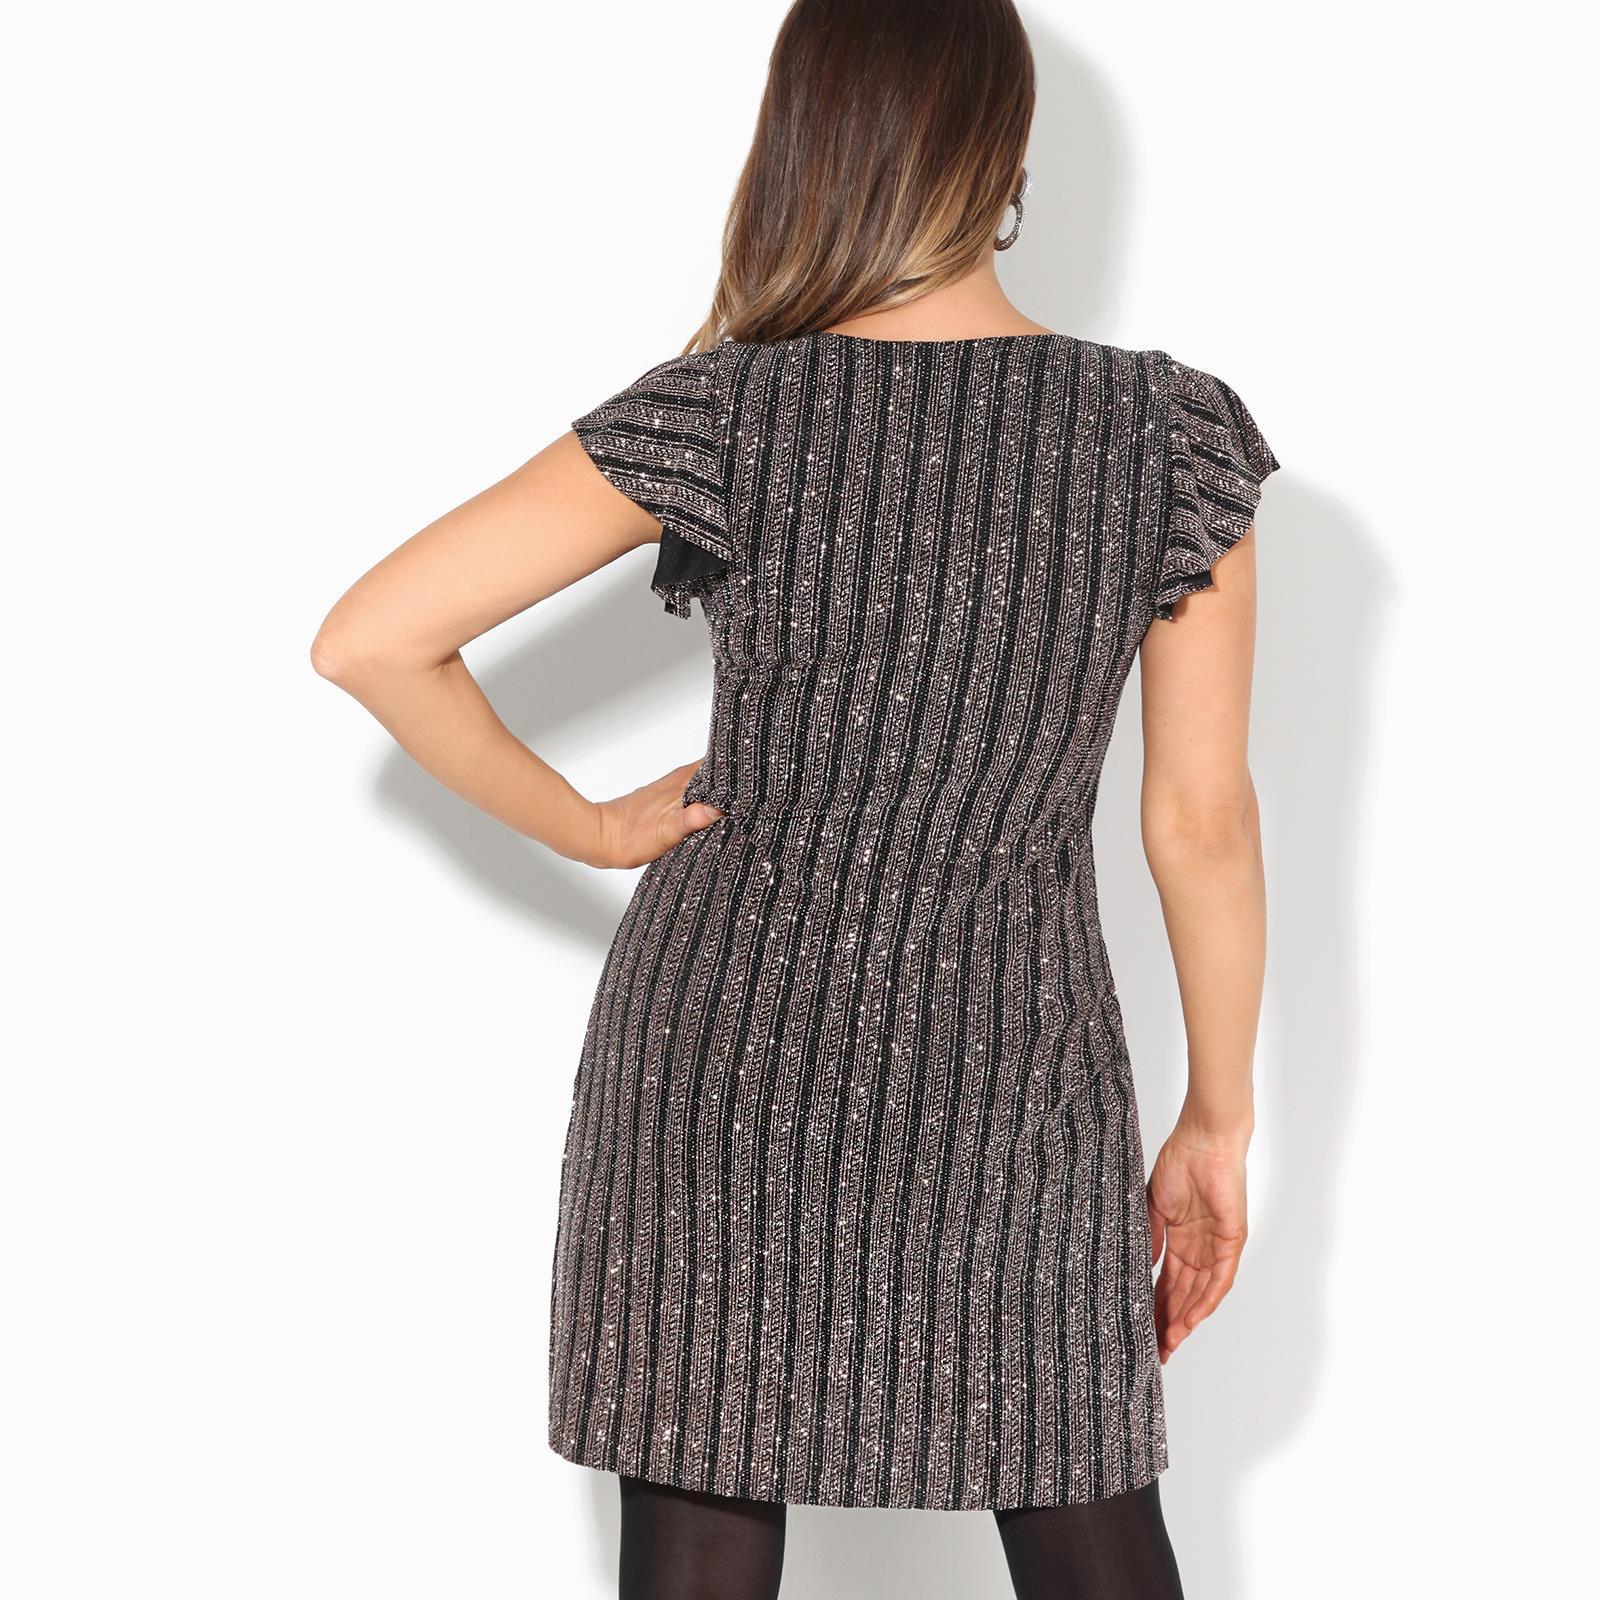 Womens-Ladies-Sequin-Glitter-Dress-Party-Ruffle-Sleeve-Evening-Lurex-Tunic-Top thumbnail 4